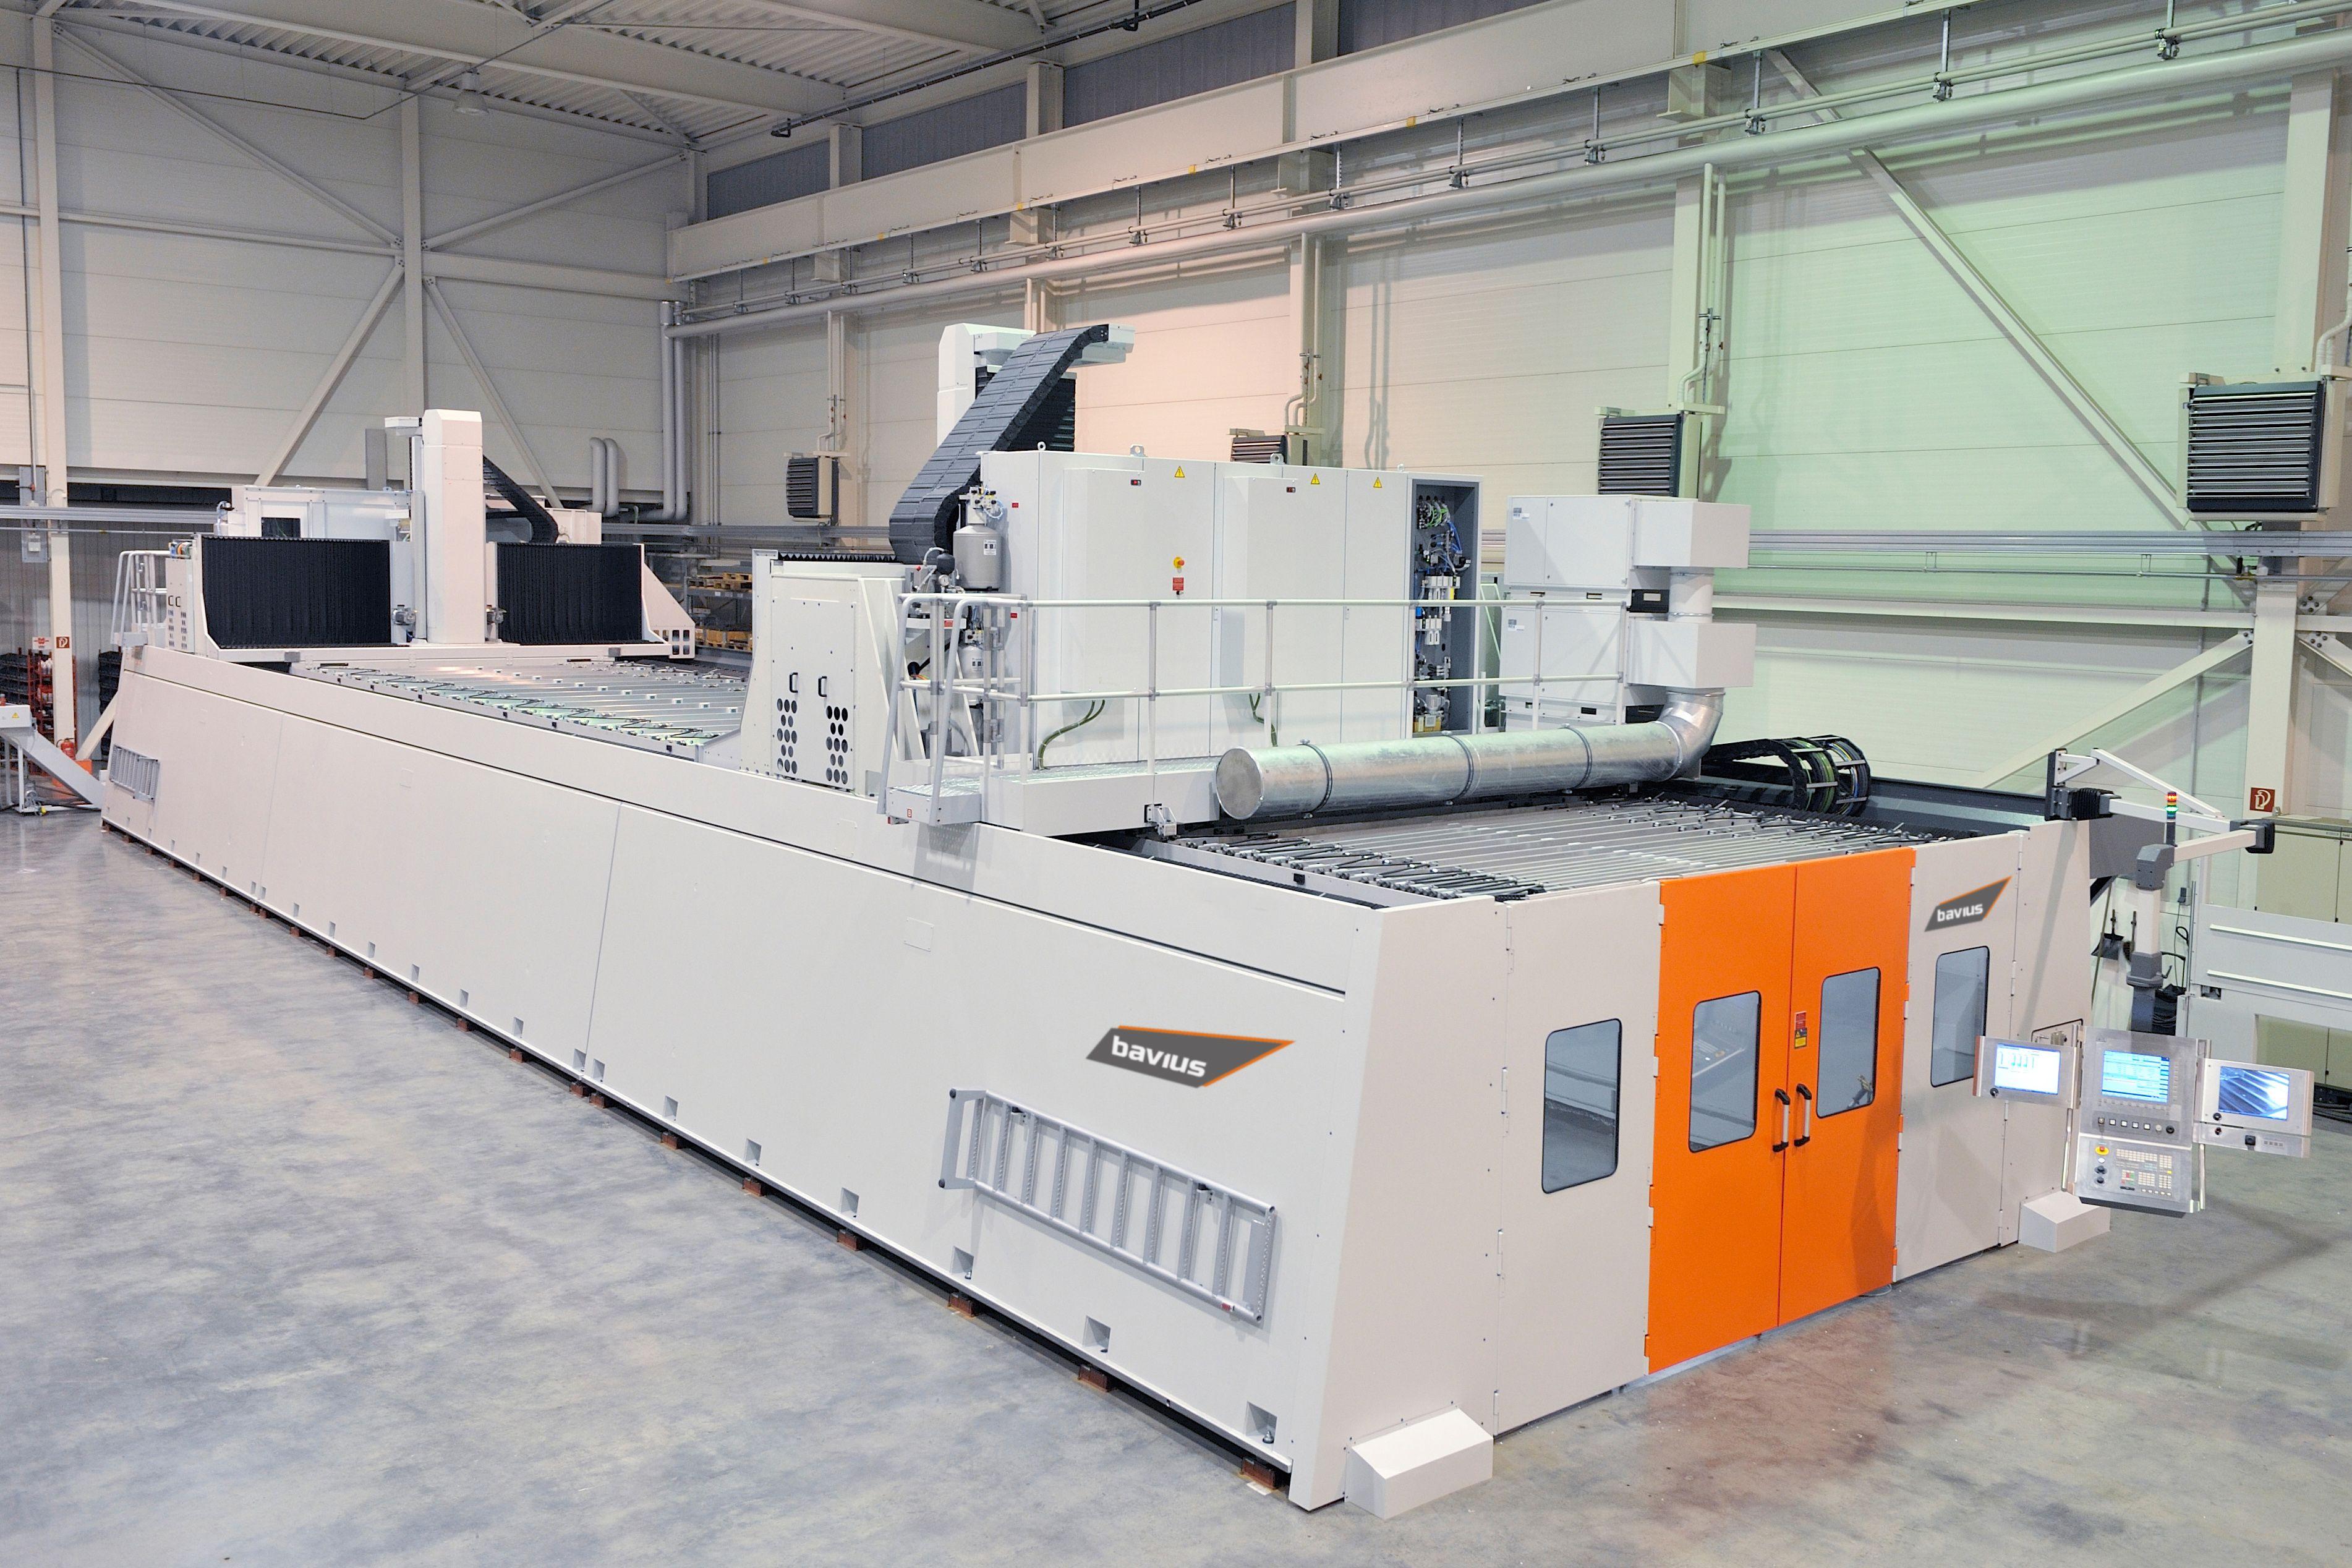 bavius-upper-gantry-machining-centres-gantry-sd